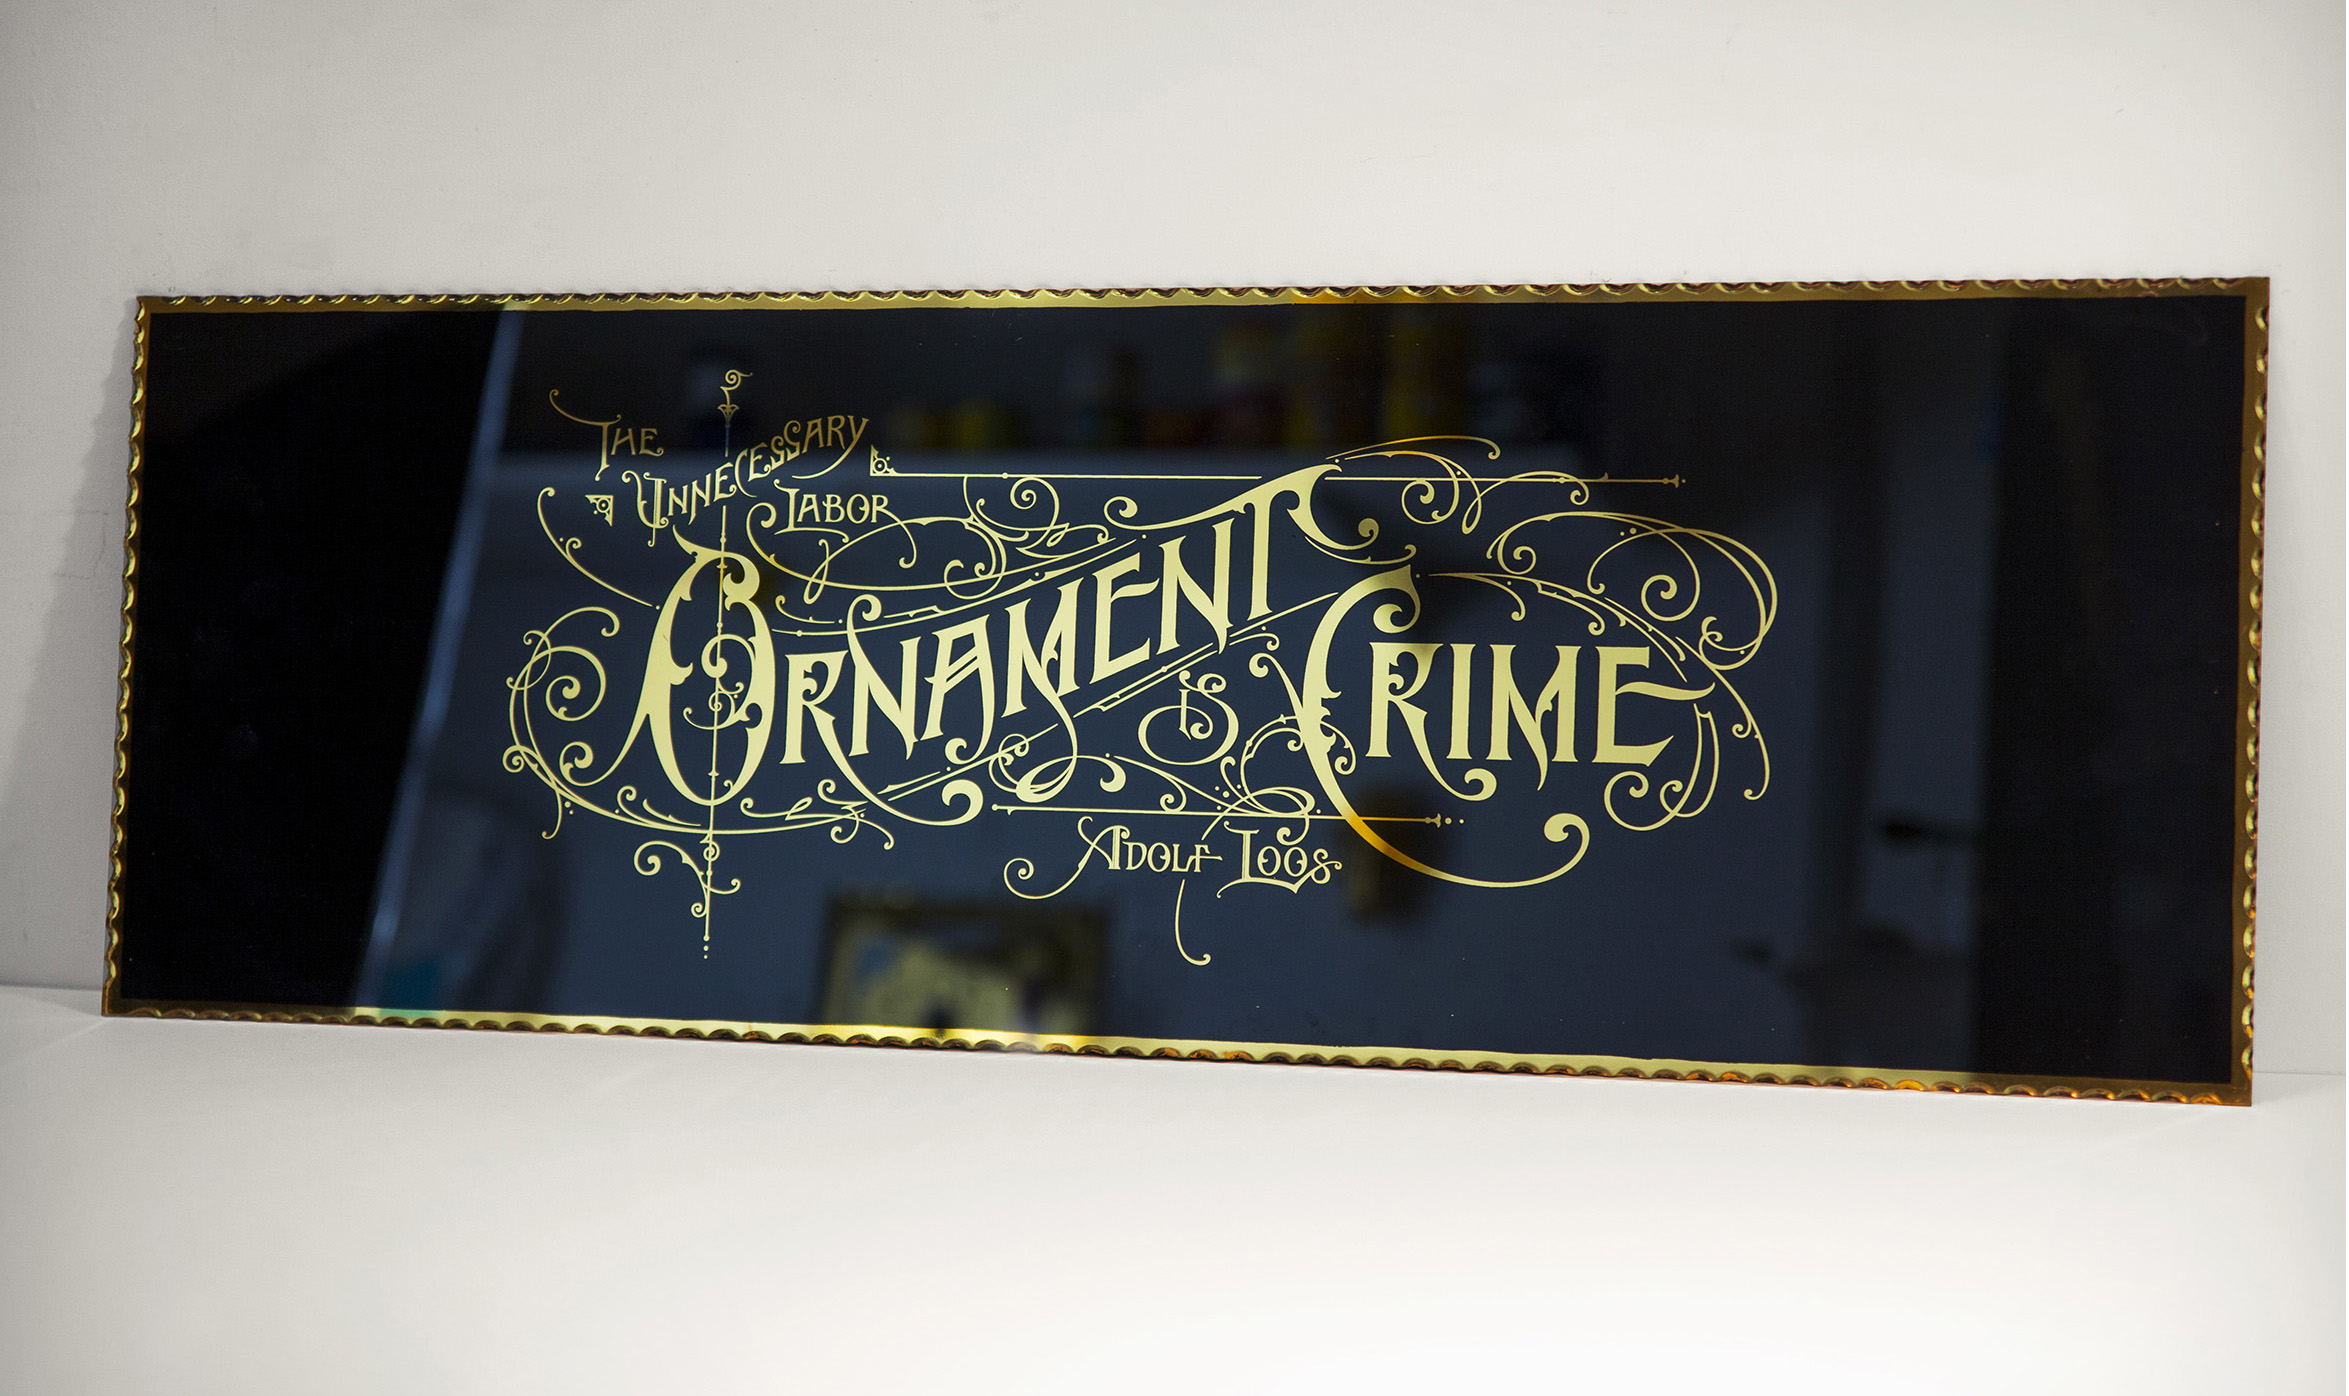 04 Ornament.jpg